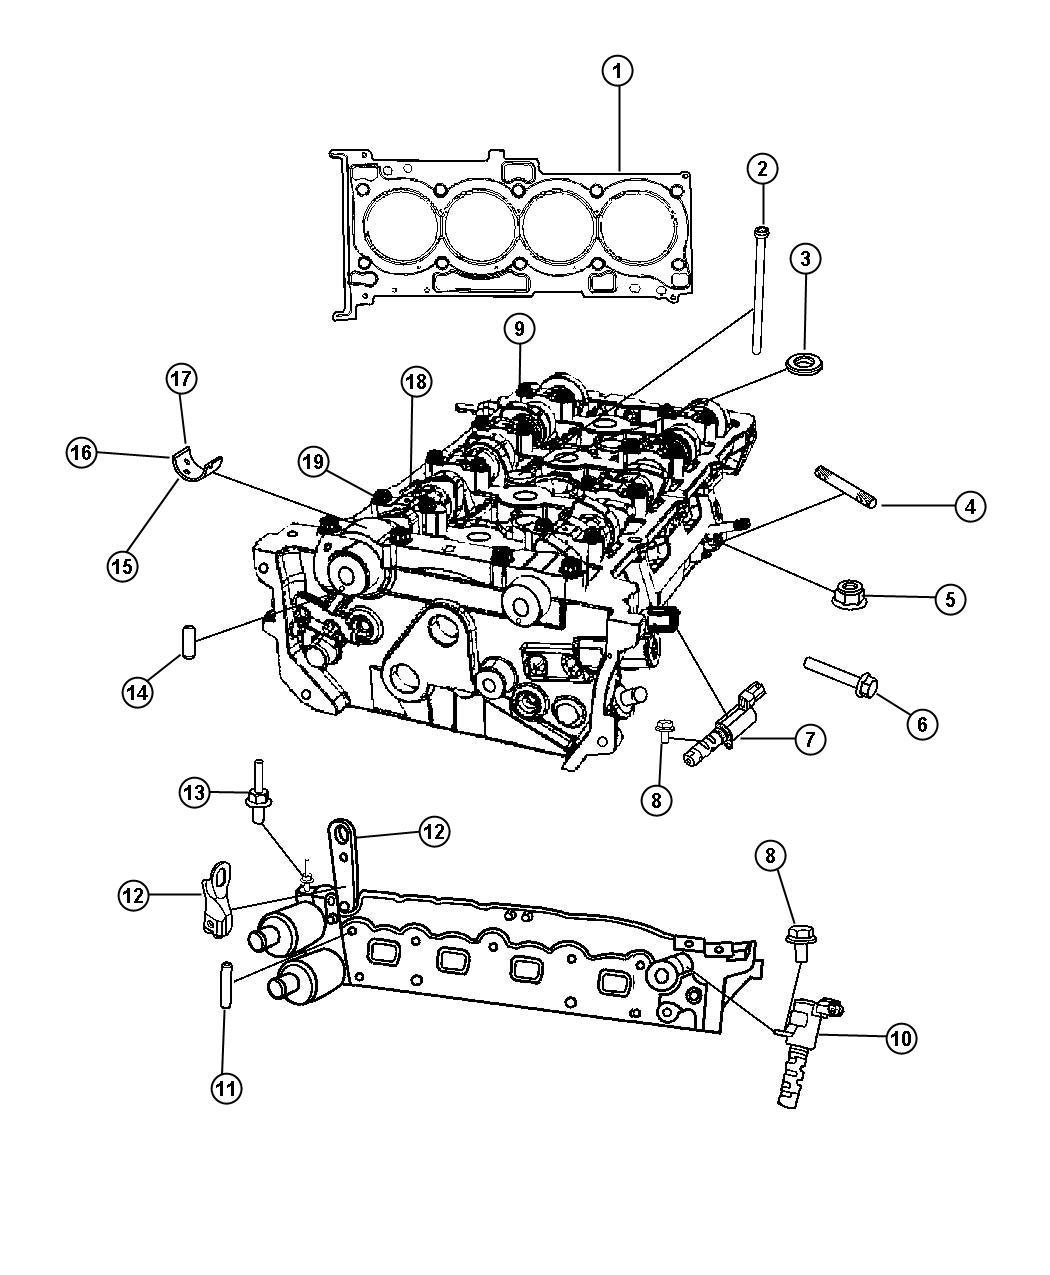 Jeep Patriot Control valve, solenoid. Oil intake, variable